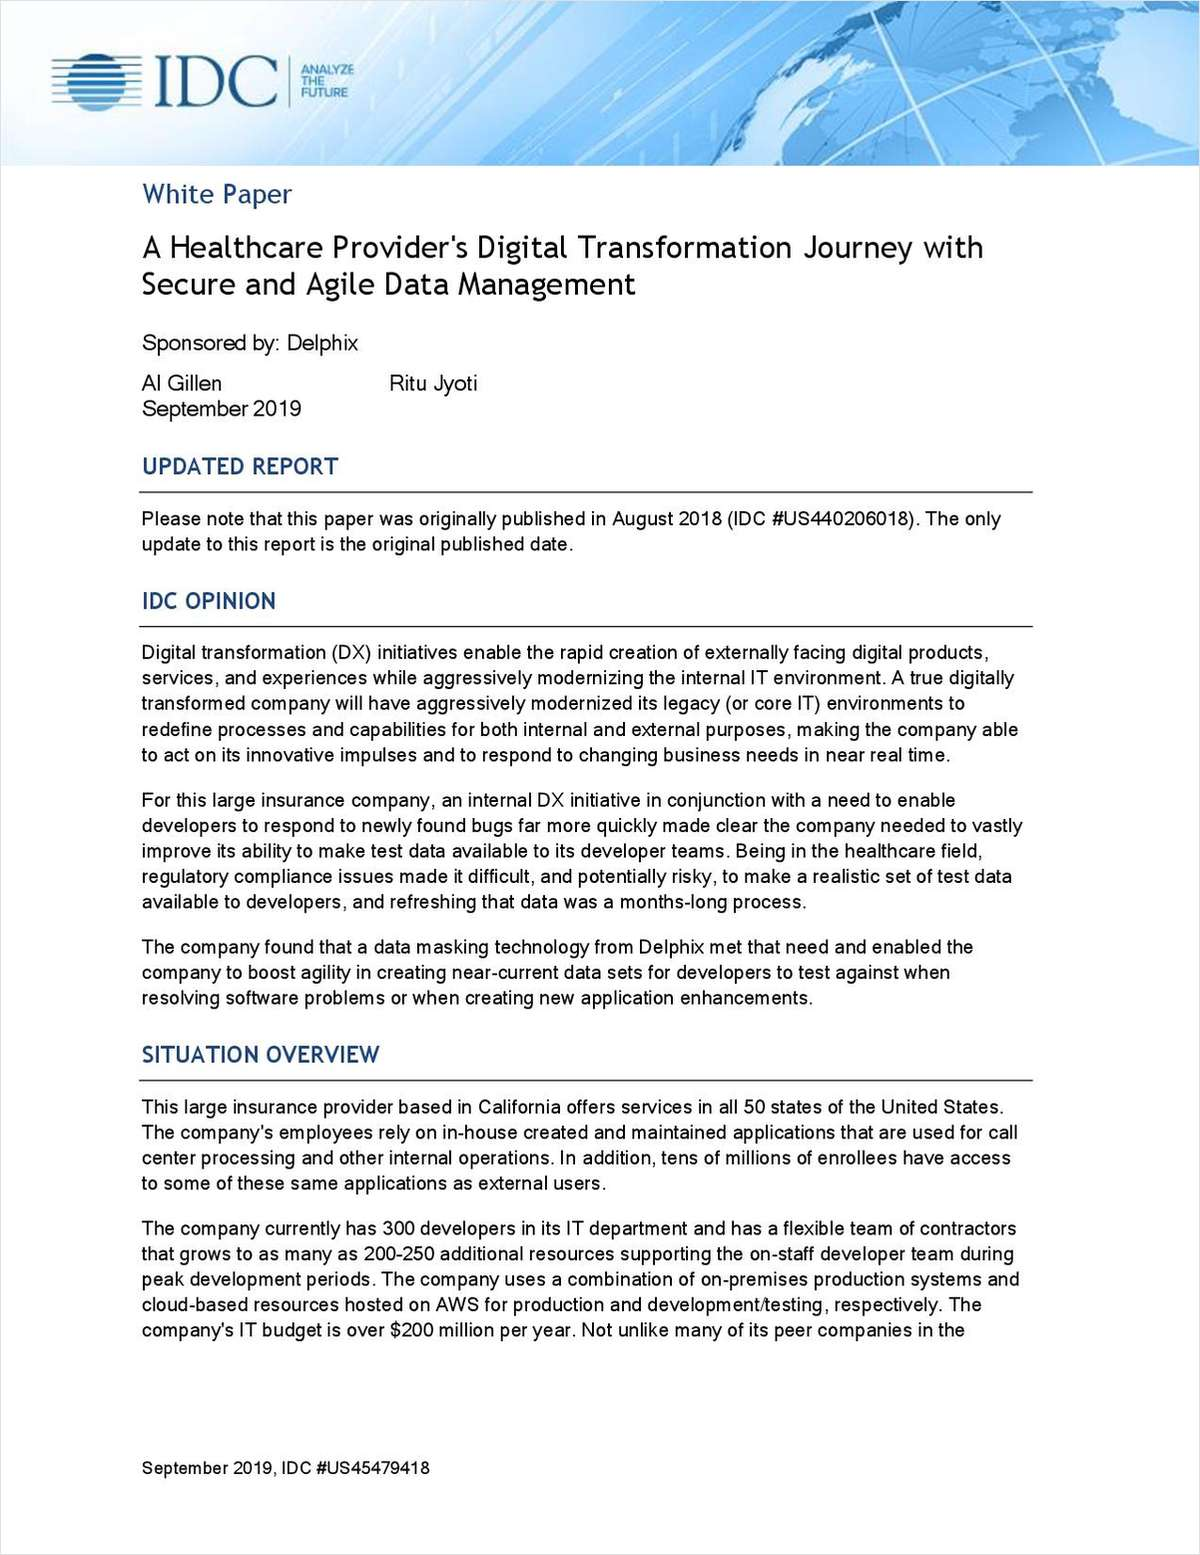 A Healthcare Provider's Digital Transformation Journey